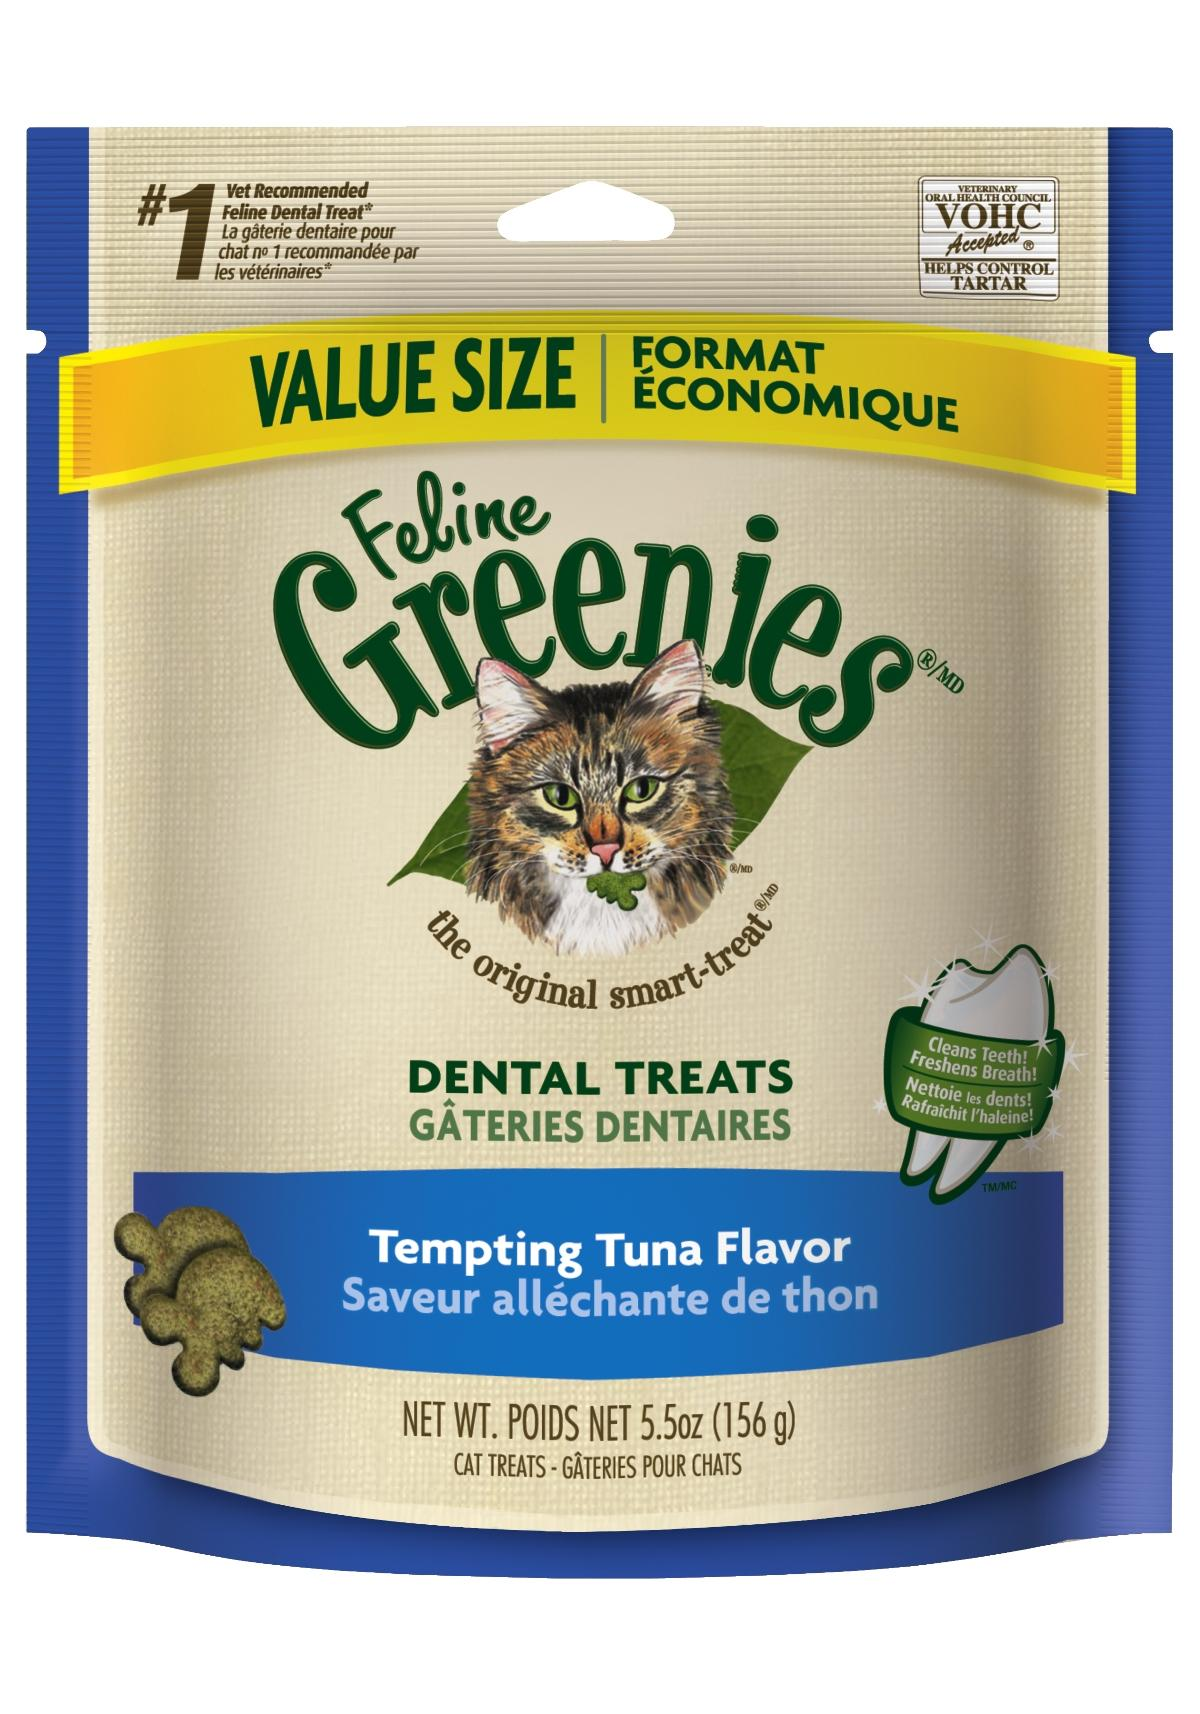 Dental Treats  - Tempting Tuna Flavor thumbnail3